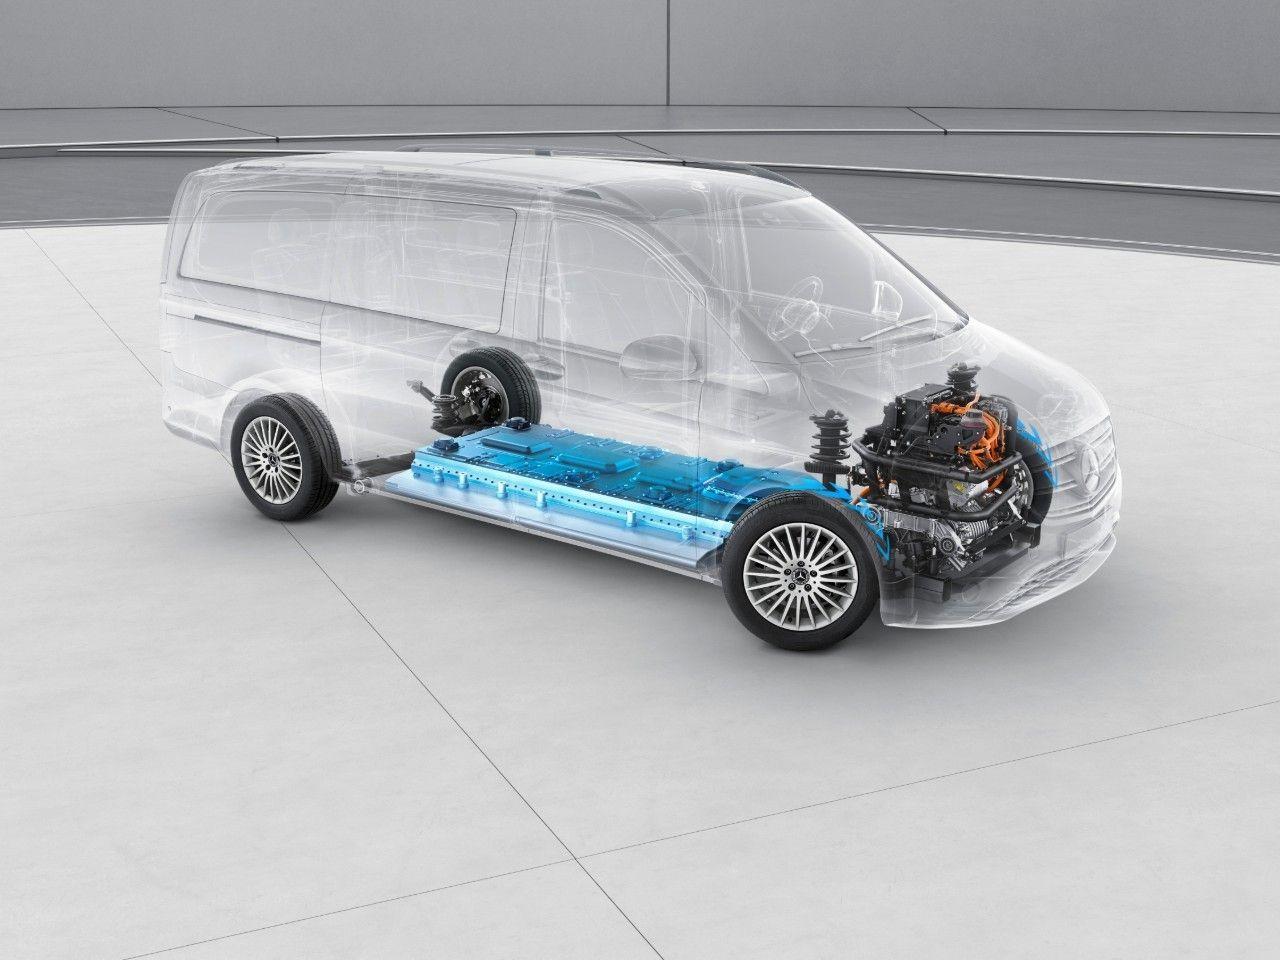 Mercedesbenz evito transparant techniek rolandtameling